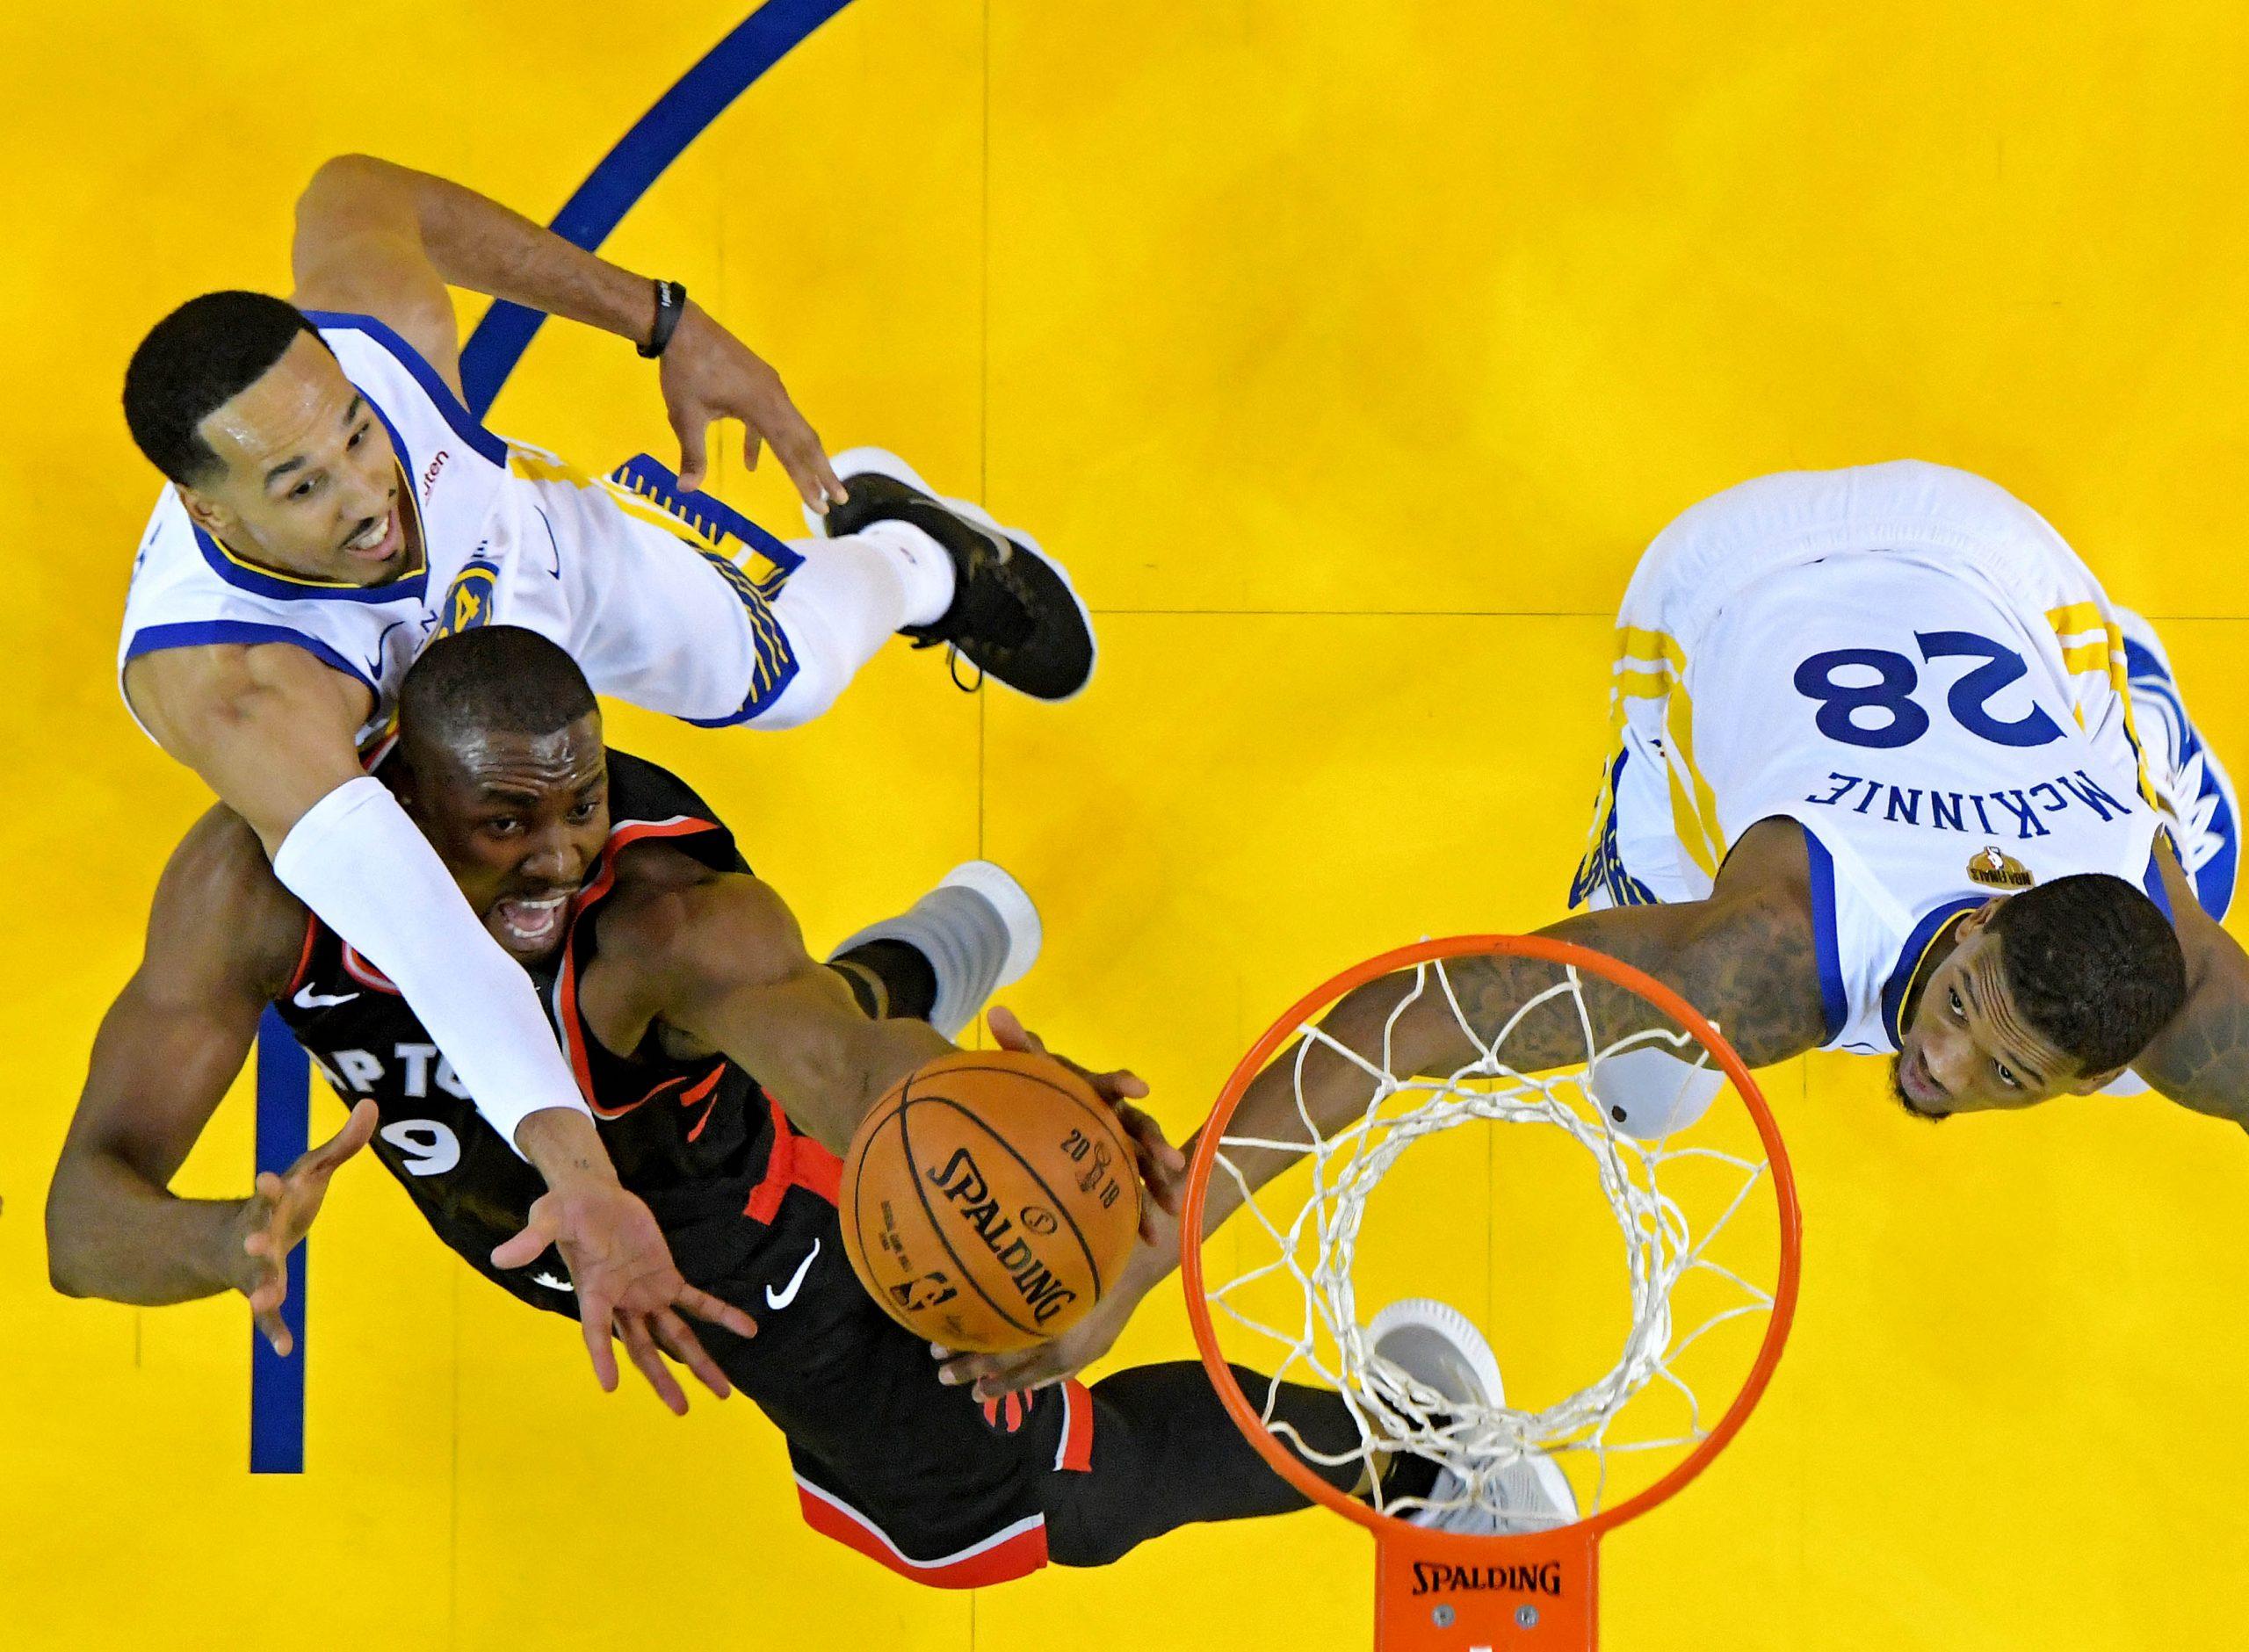 foto: REUTERS / Kyle Terada-USA TODAY Sports